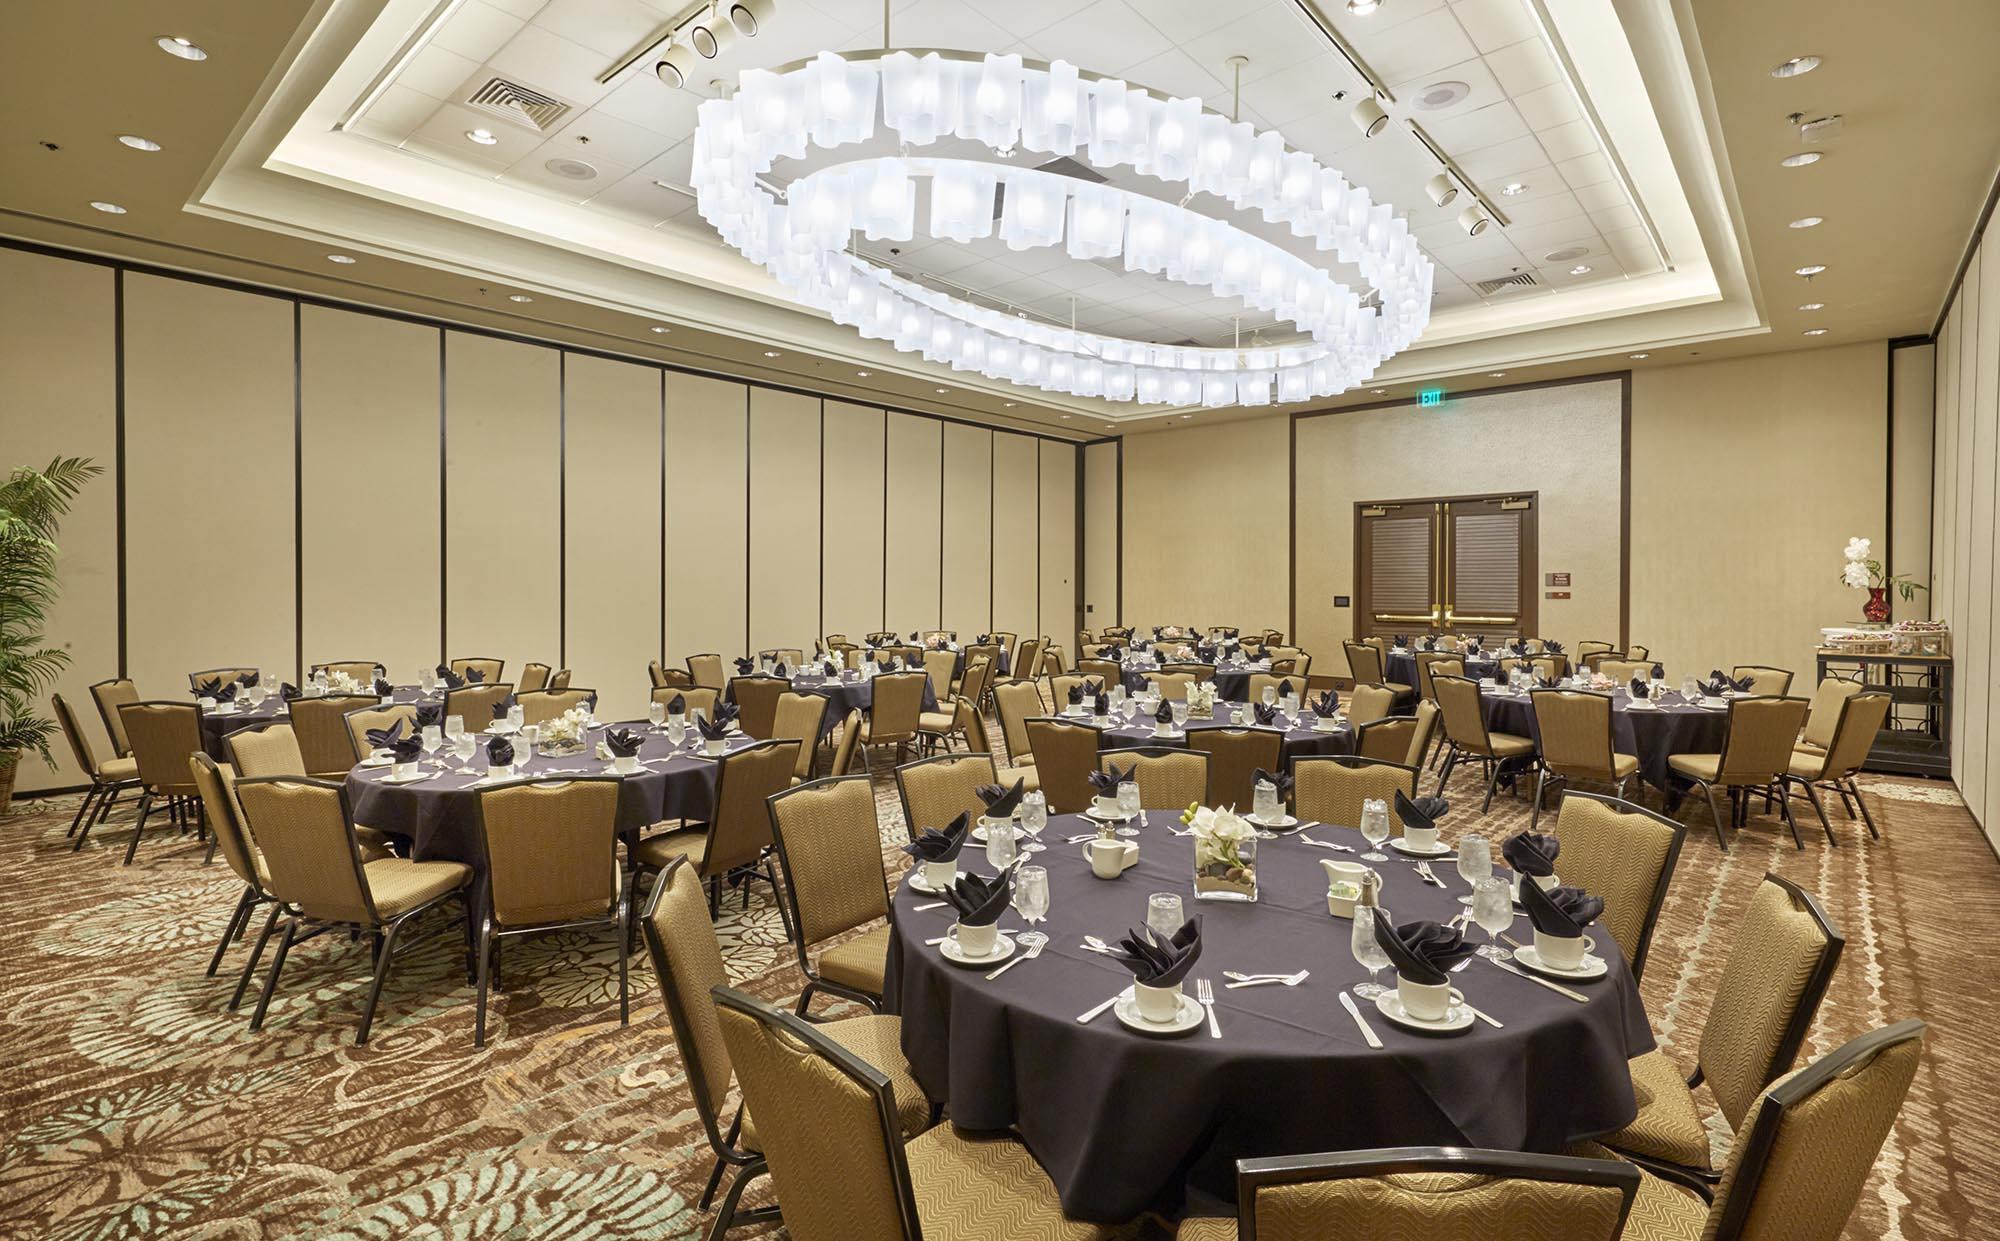 Hilton Hawaiian Village South Pacific Ballroom and Boardroom